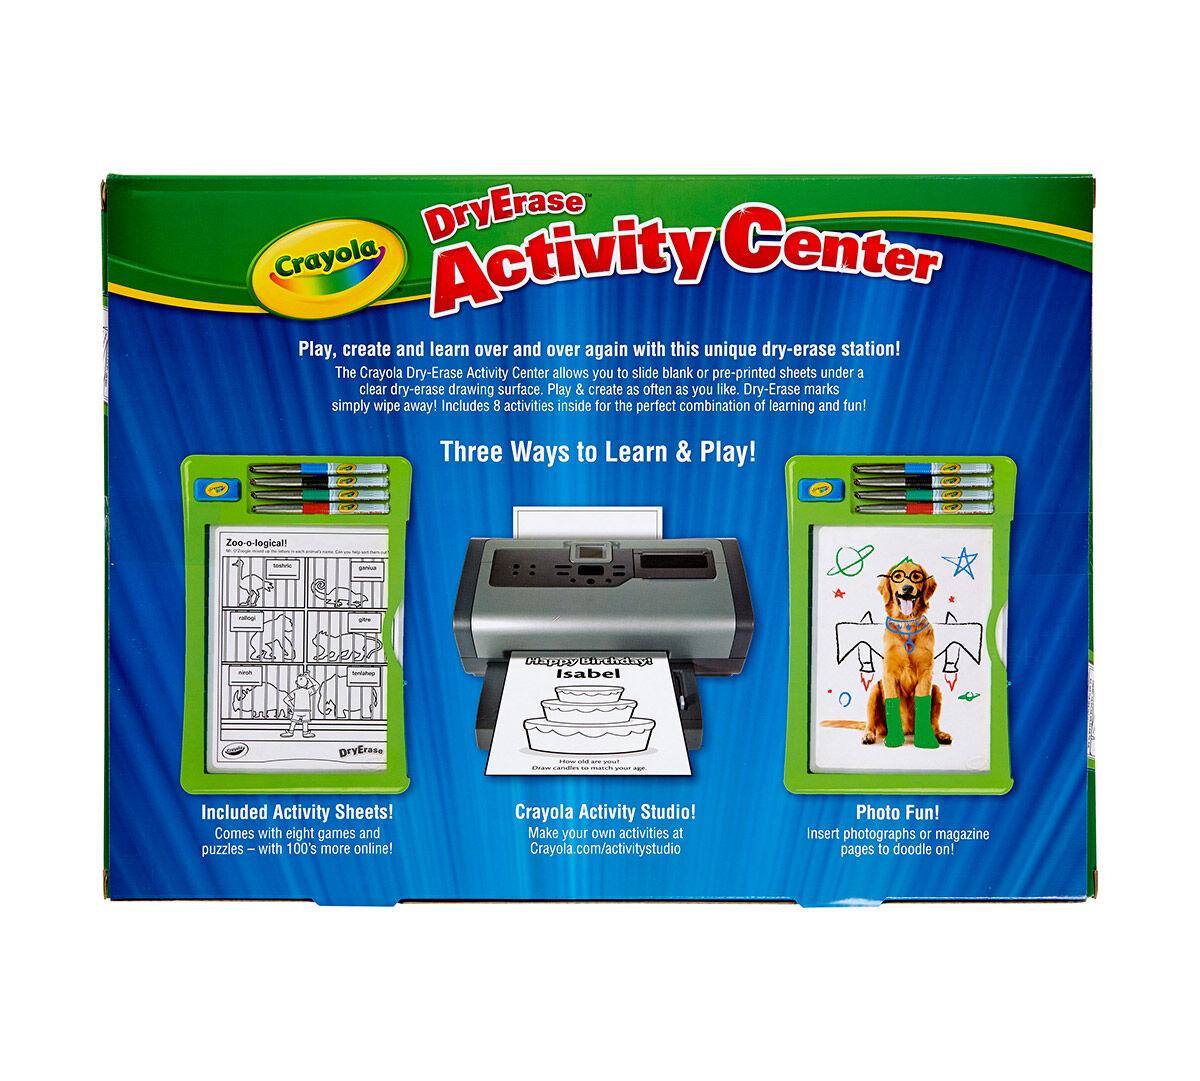 dry erase activity center - Crayola Online Drawing